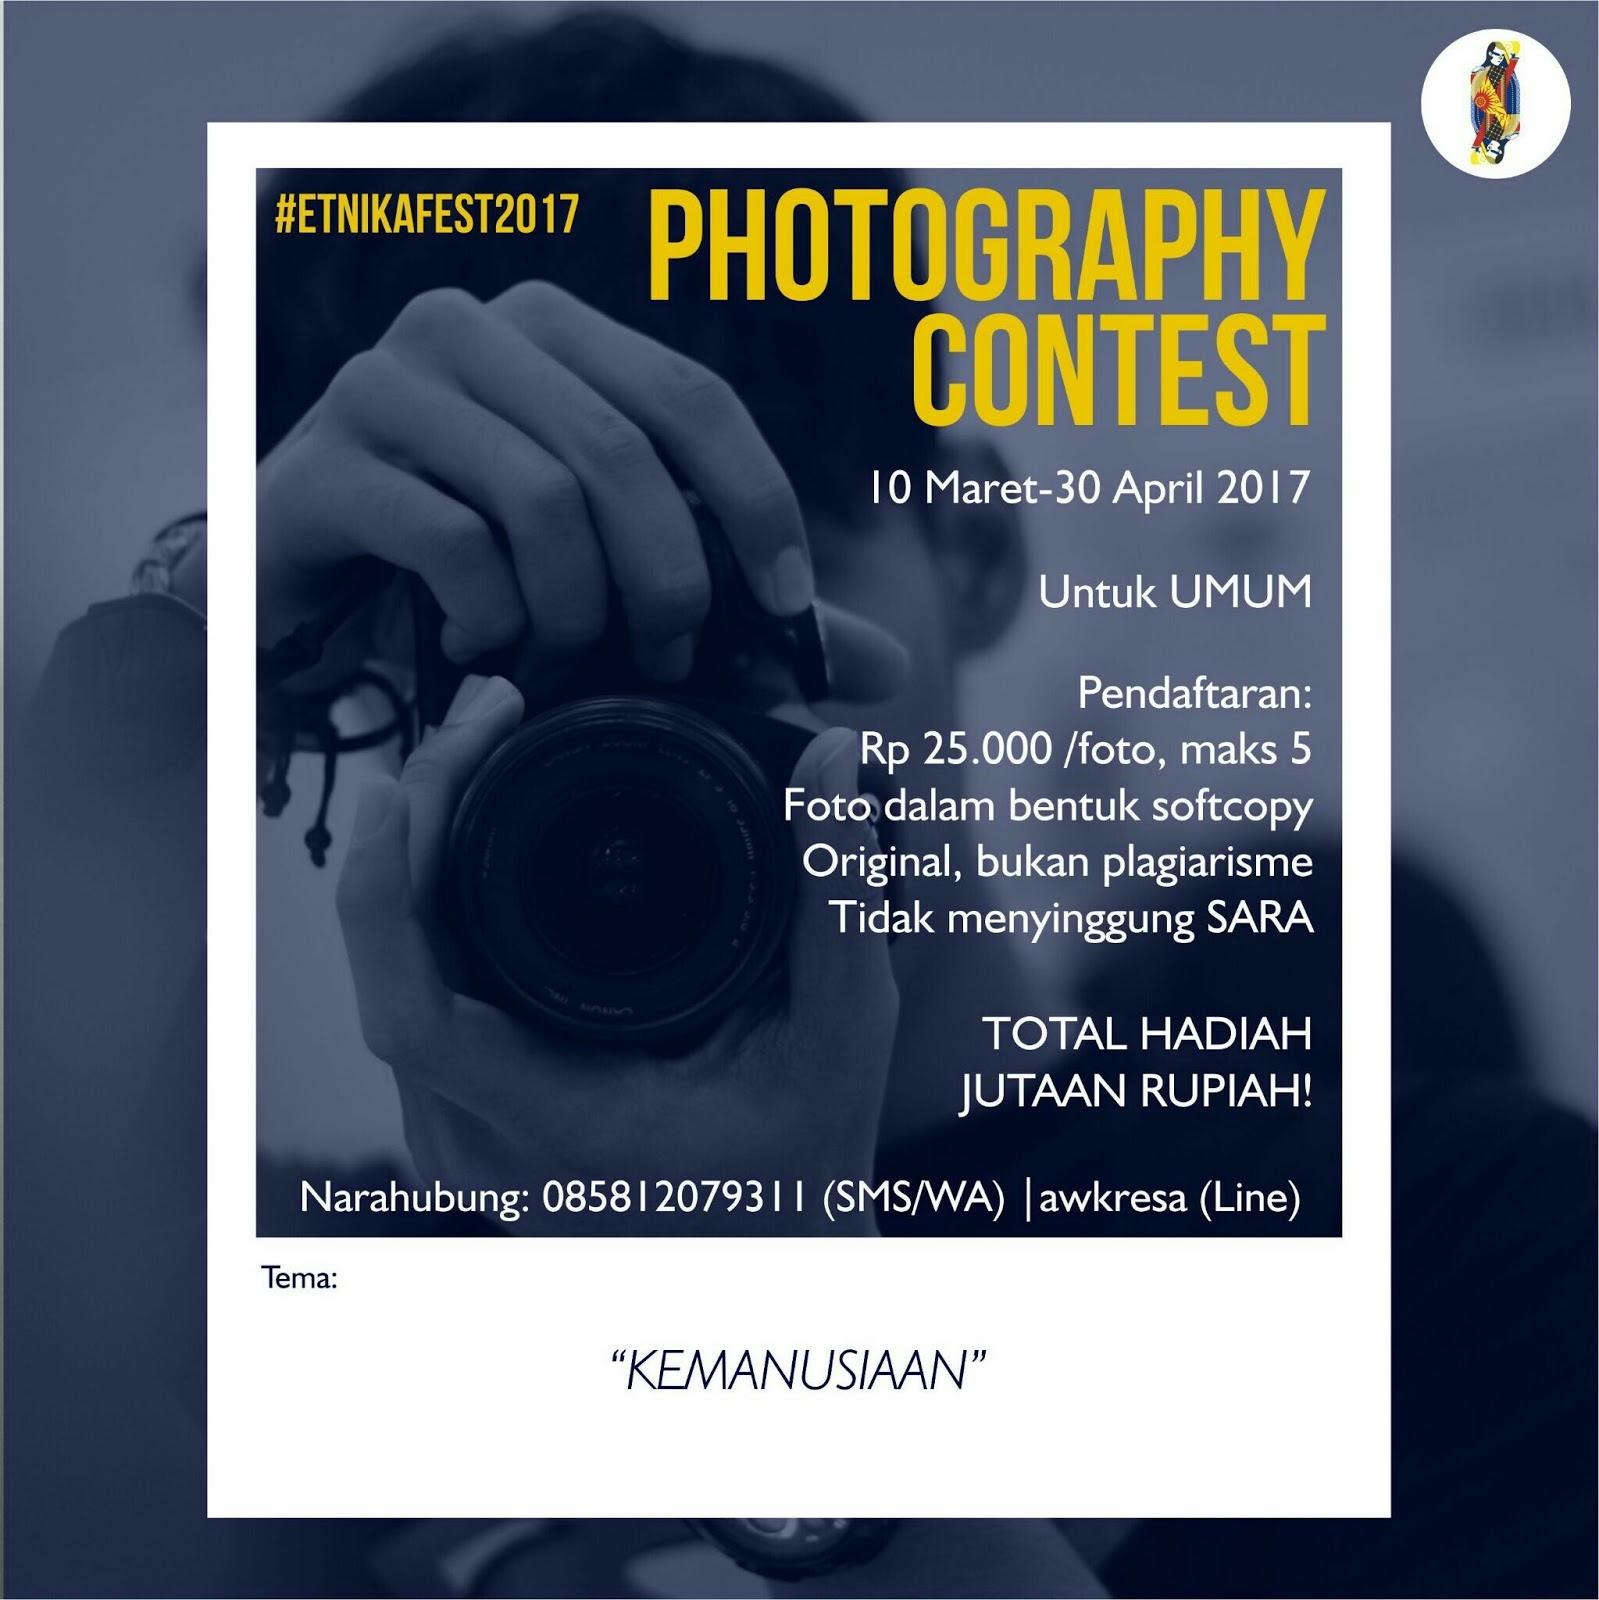 Photography Contest ETNIKA FEST 2017